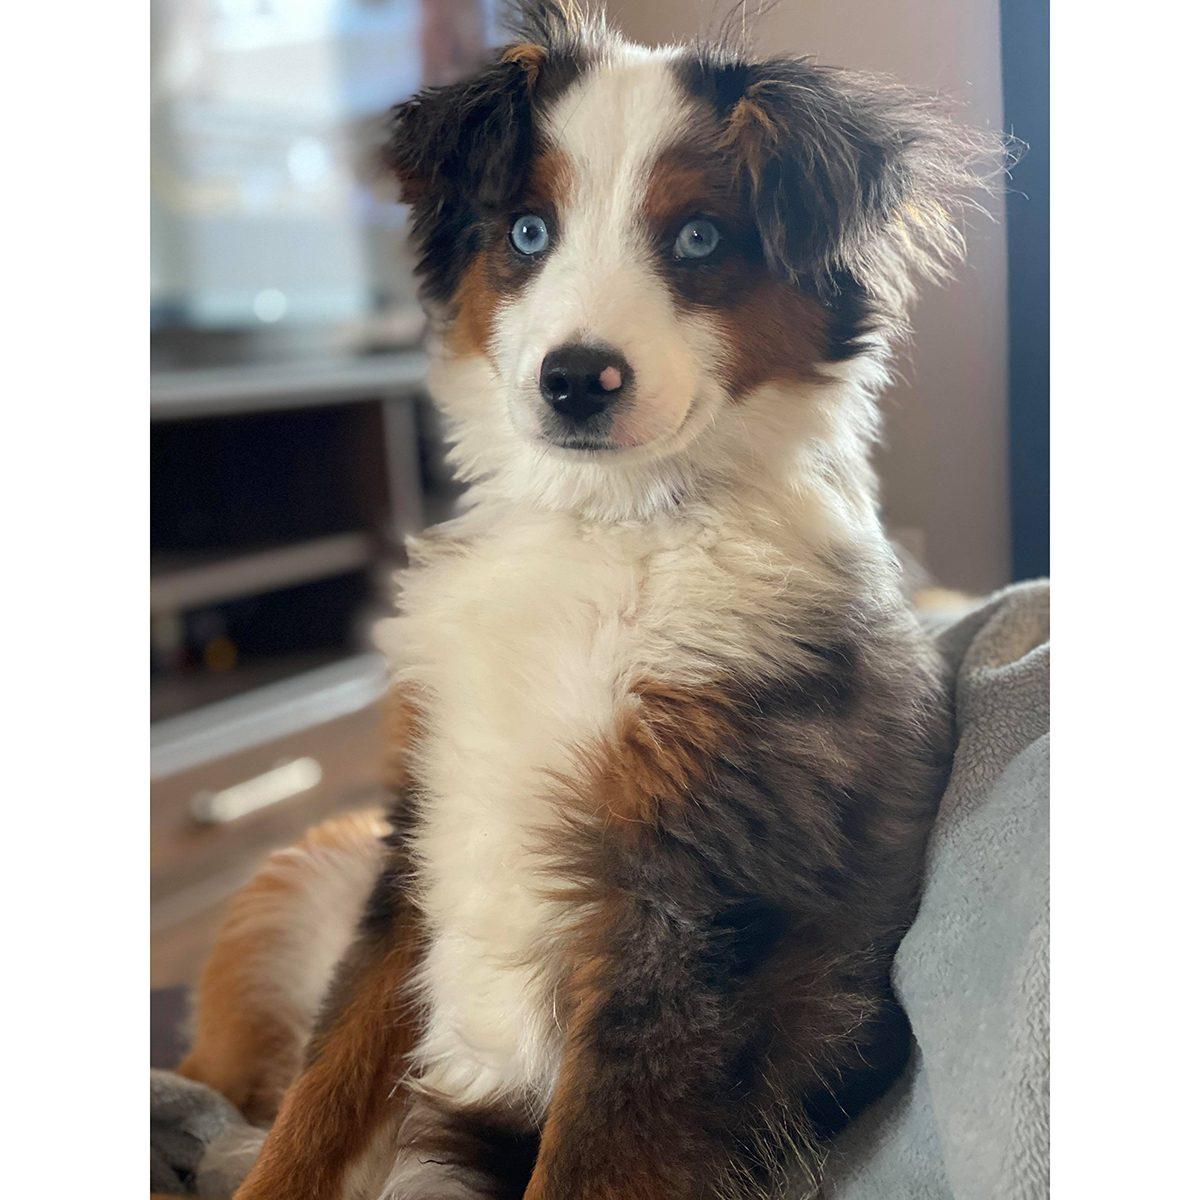 Pandemic Pet Adoption - Koda